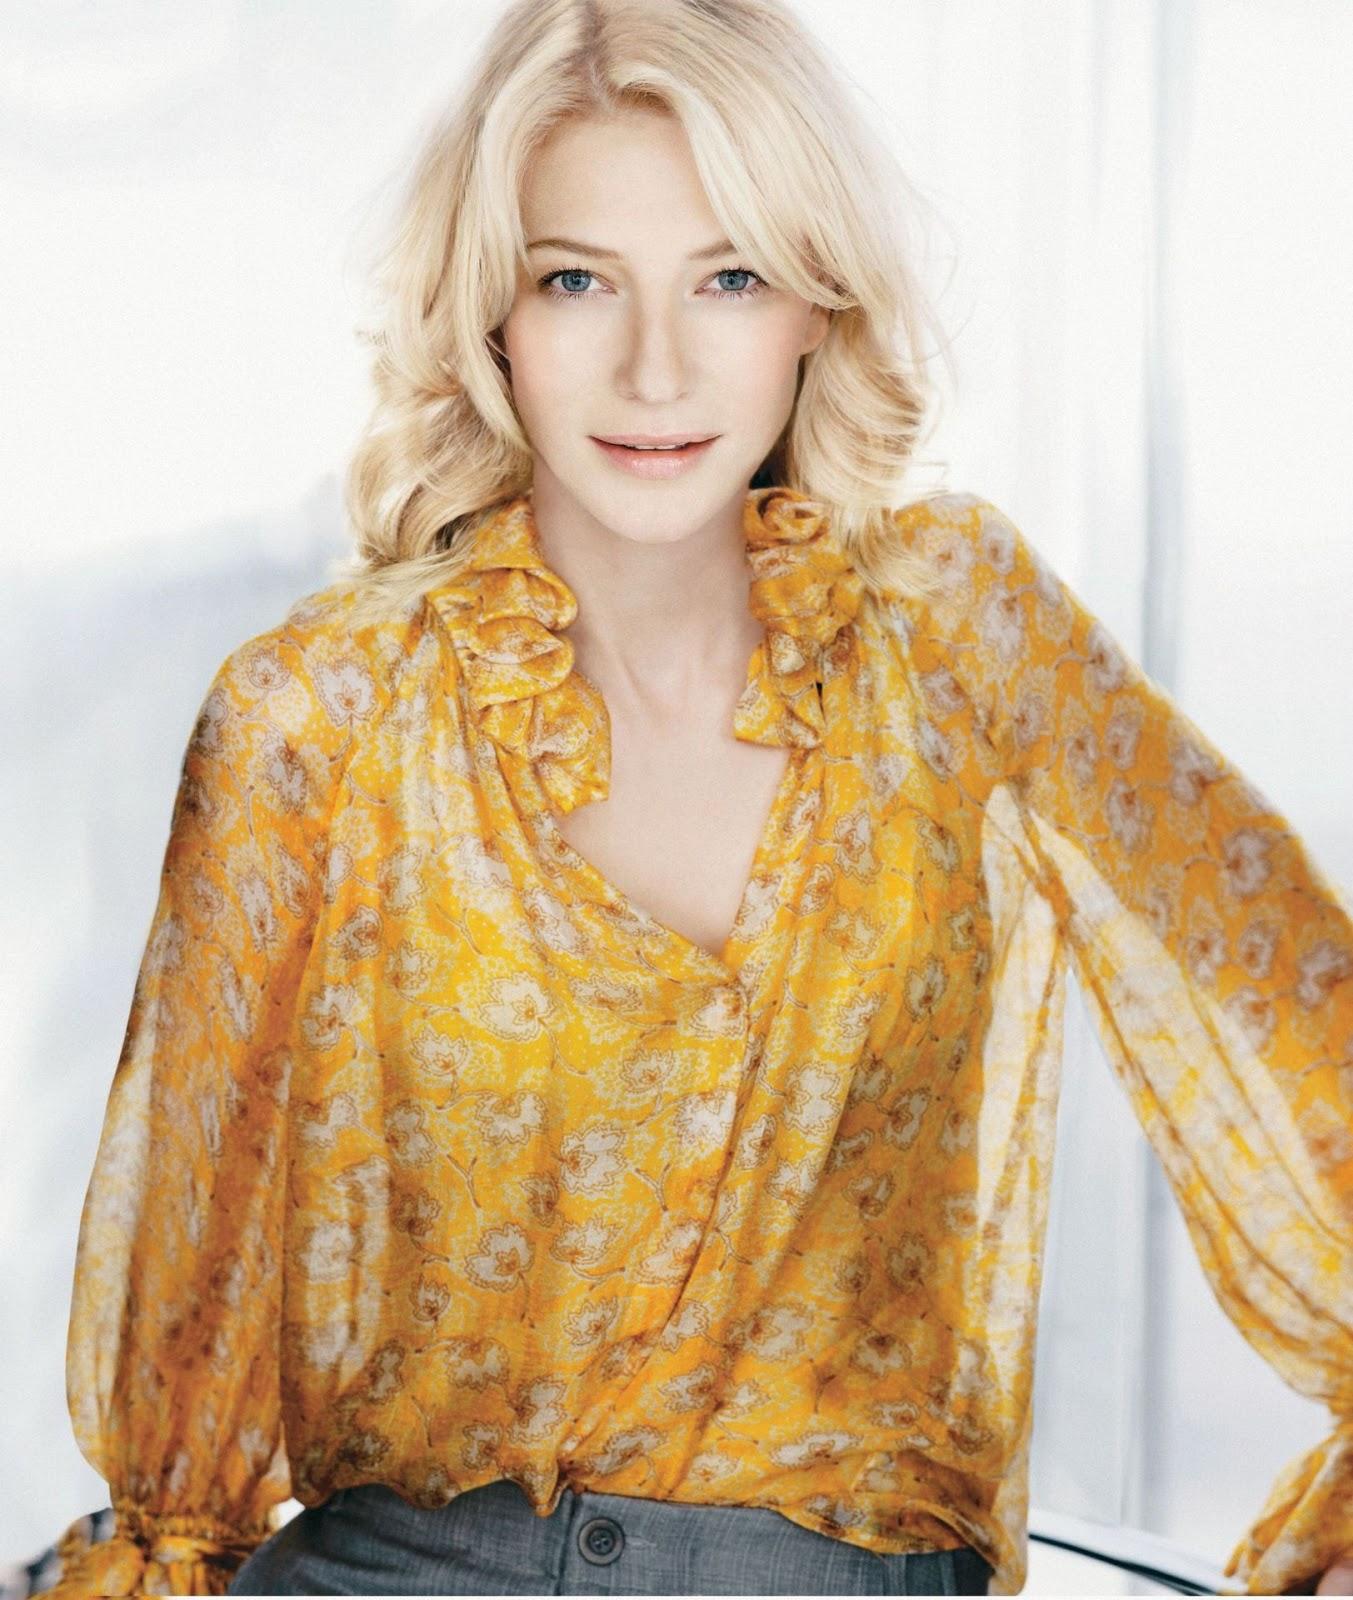 Cate Blanchett hot hd ~ ARTIST 271 Cate Blanchett